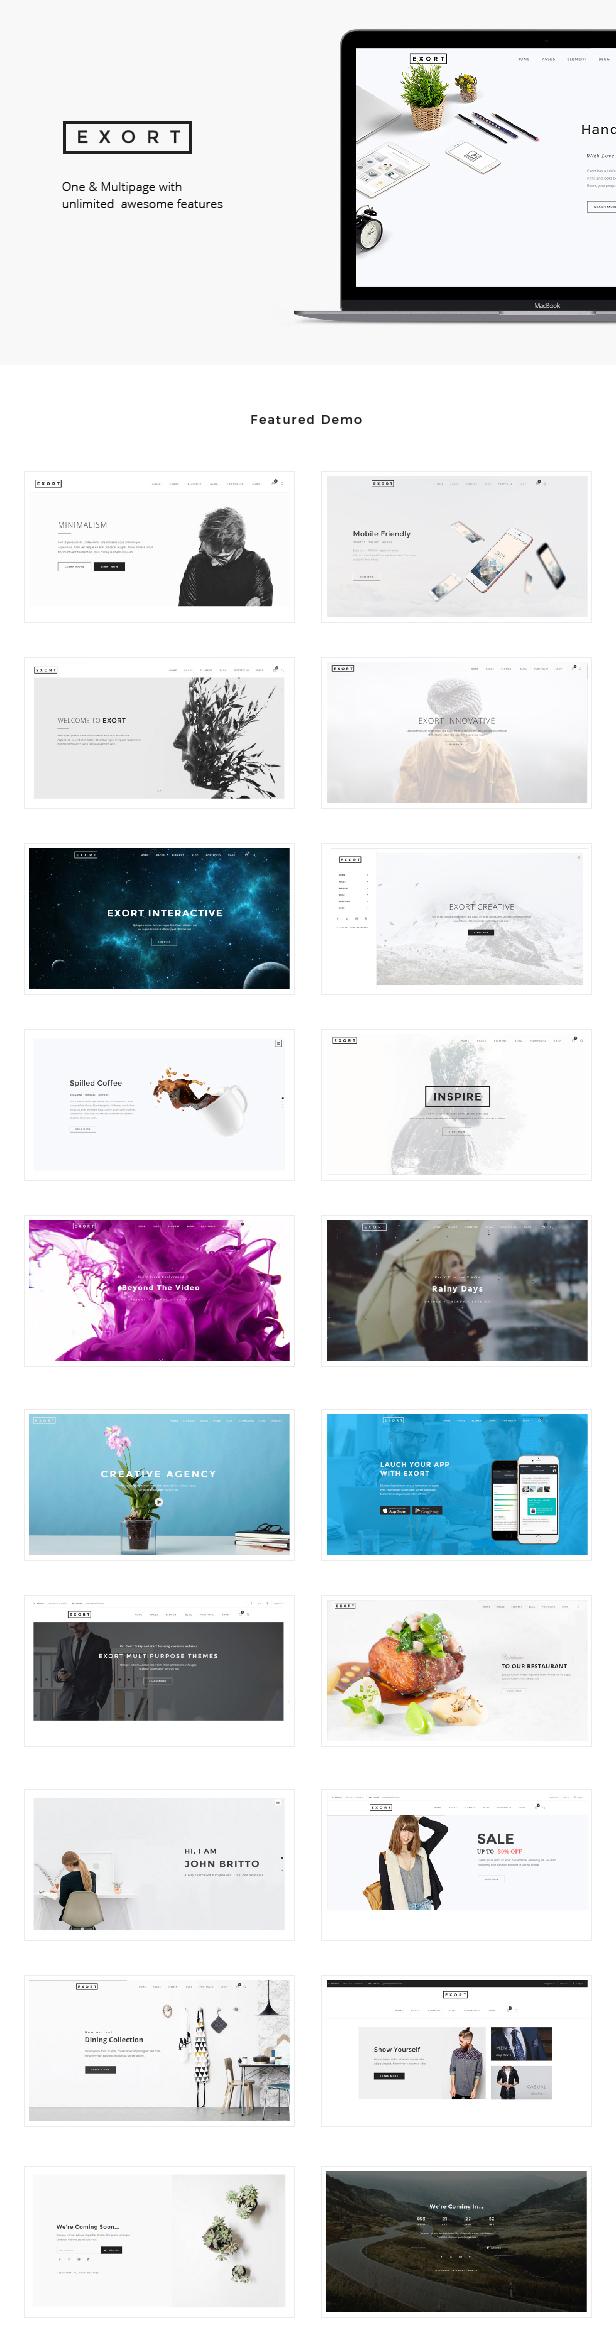 Exort - Responsive Multipurpose HTML Template (Creative) Nulled ...